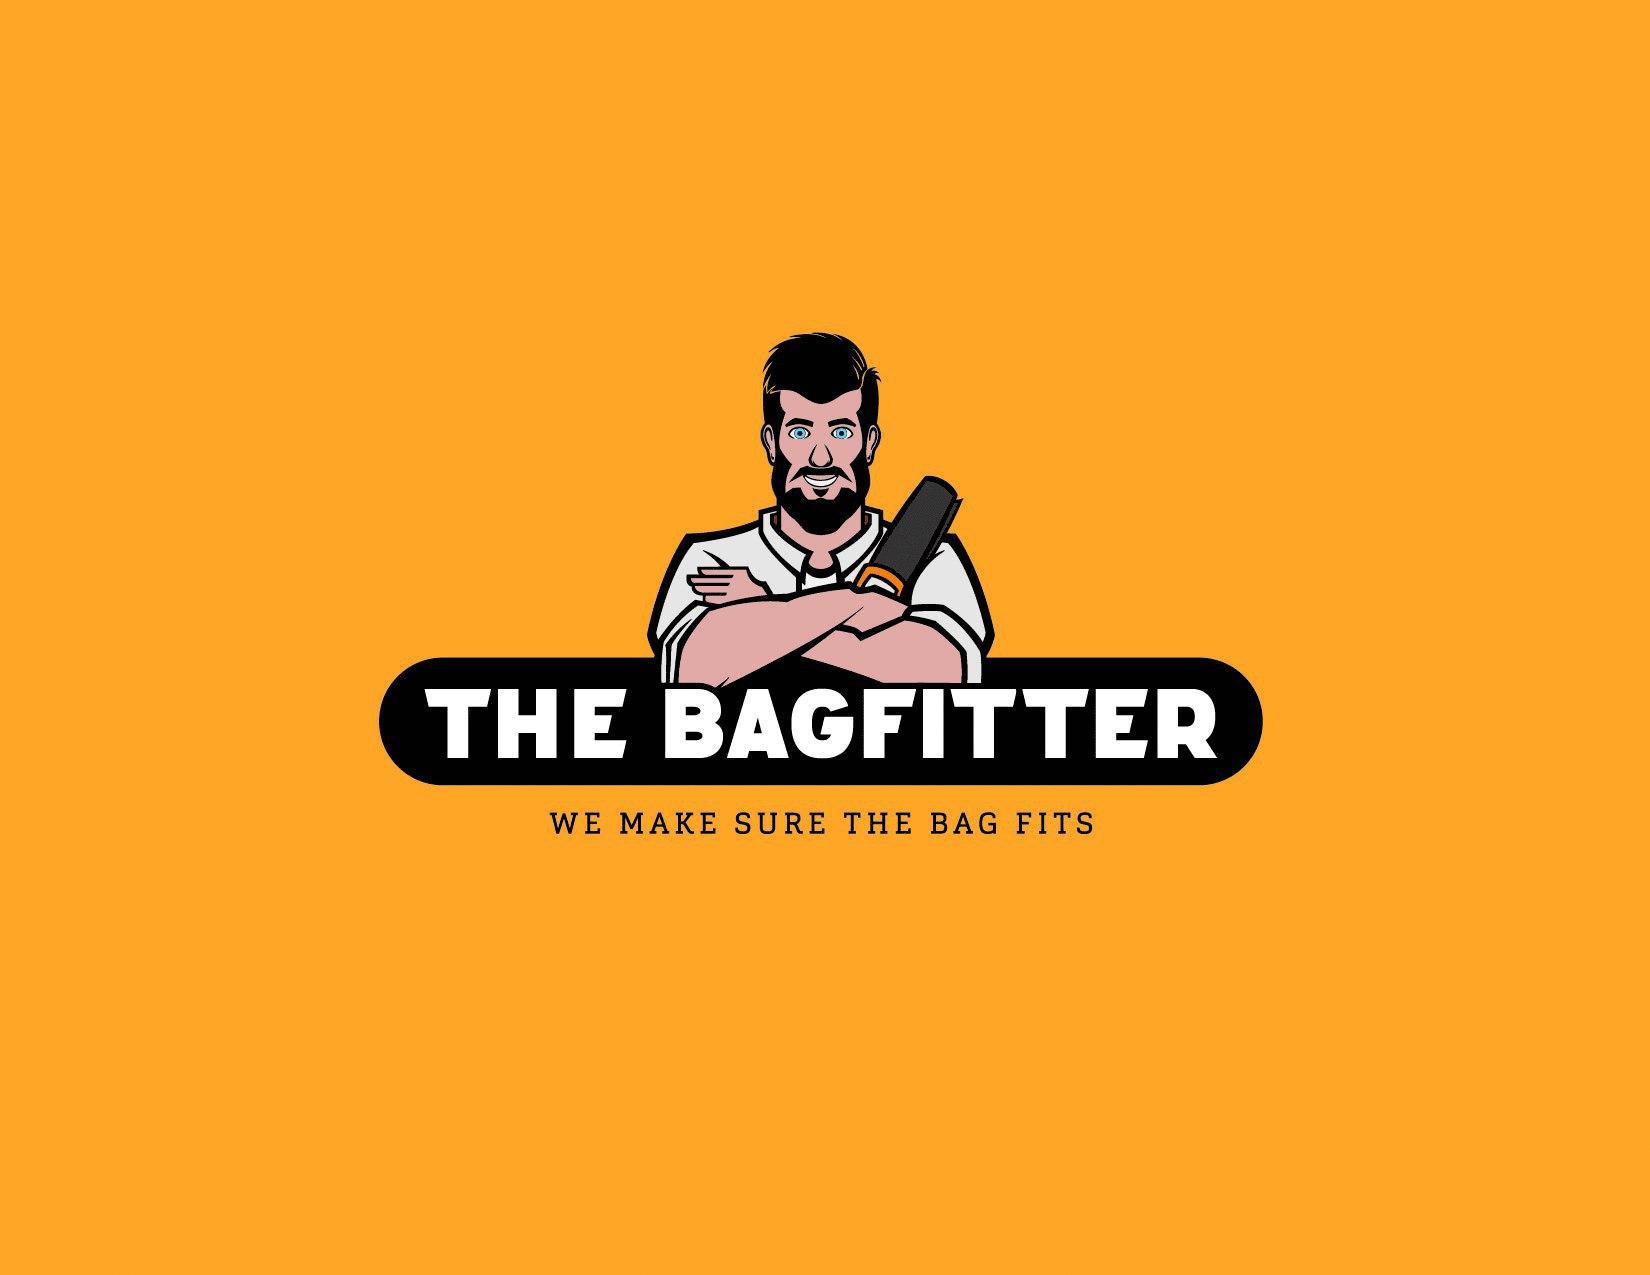 Bildmarke: THE BAGFITTER